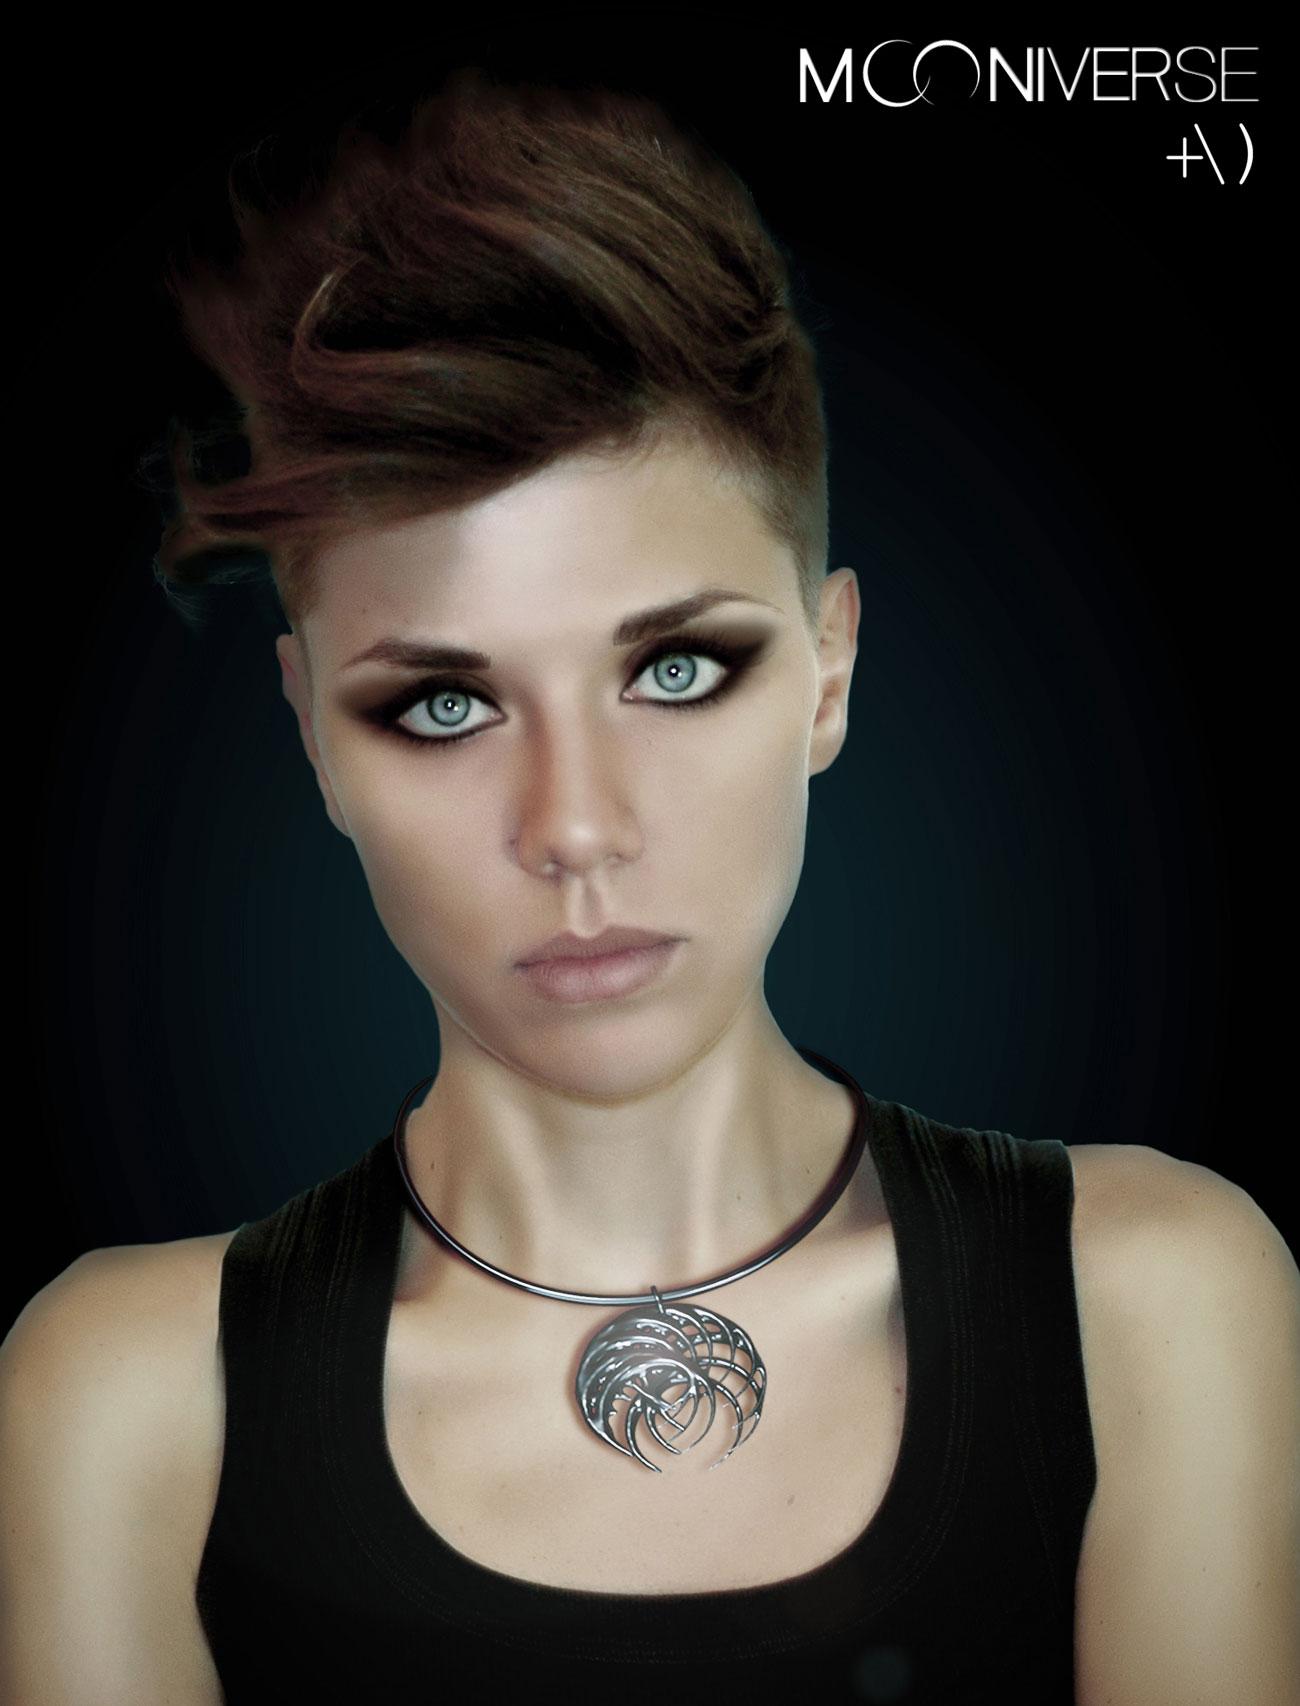 mooniverse necklace model